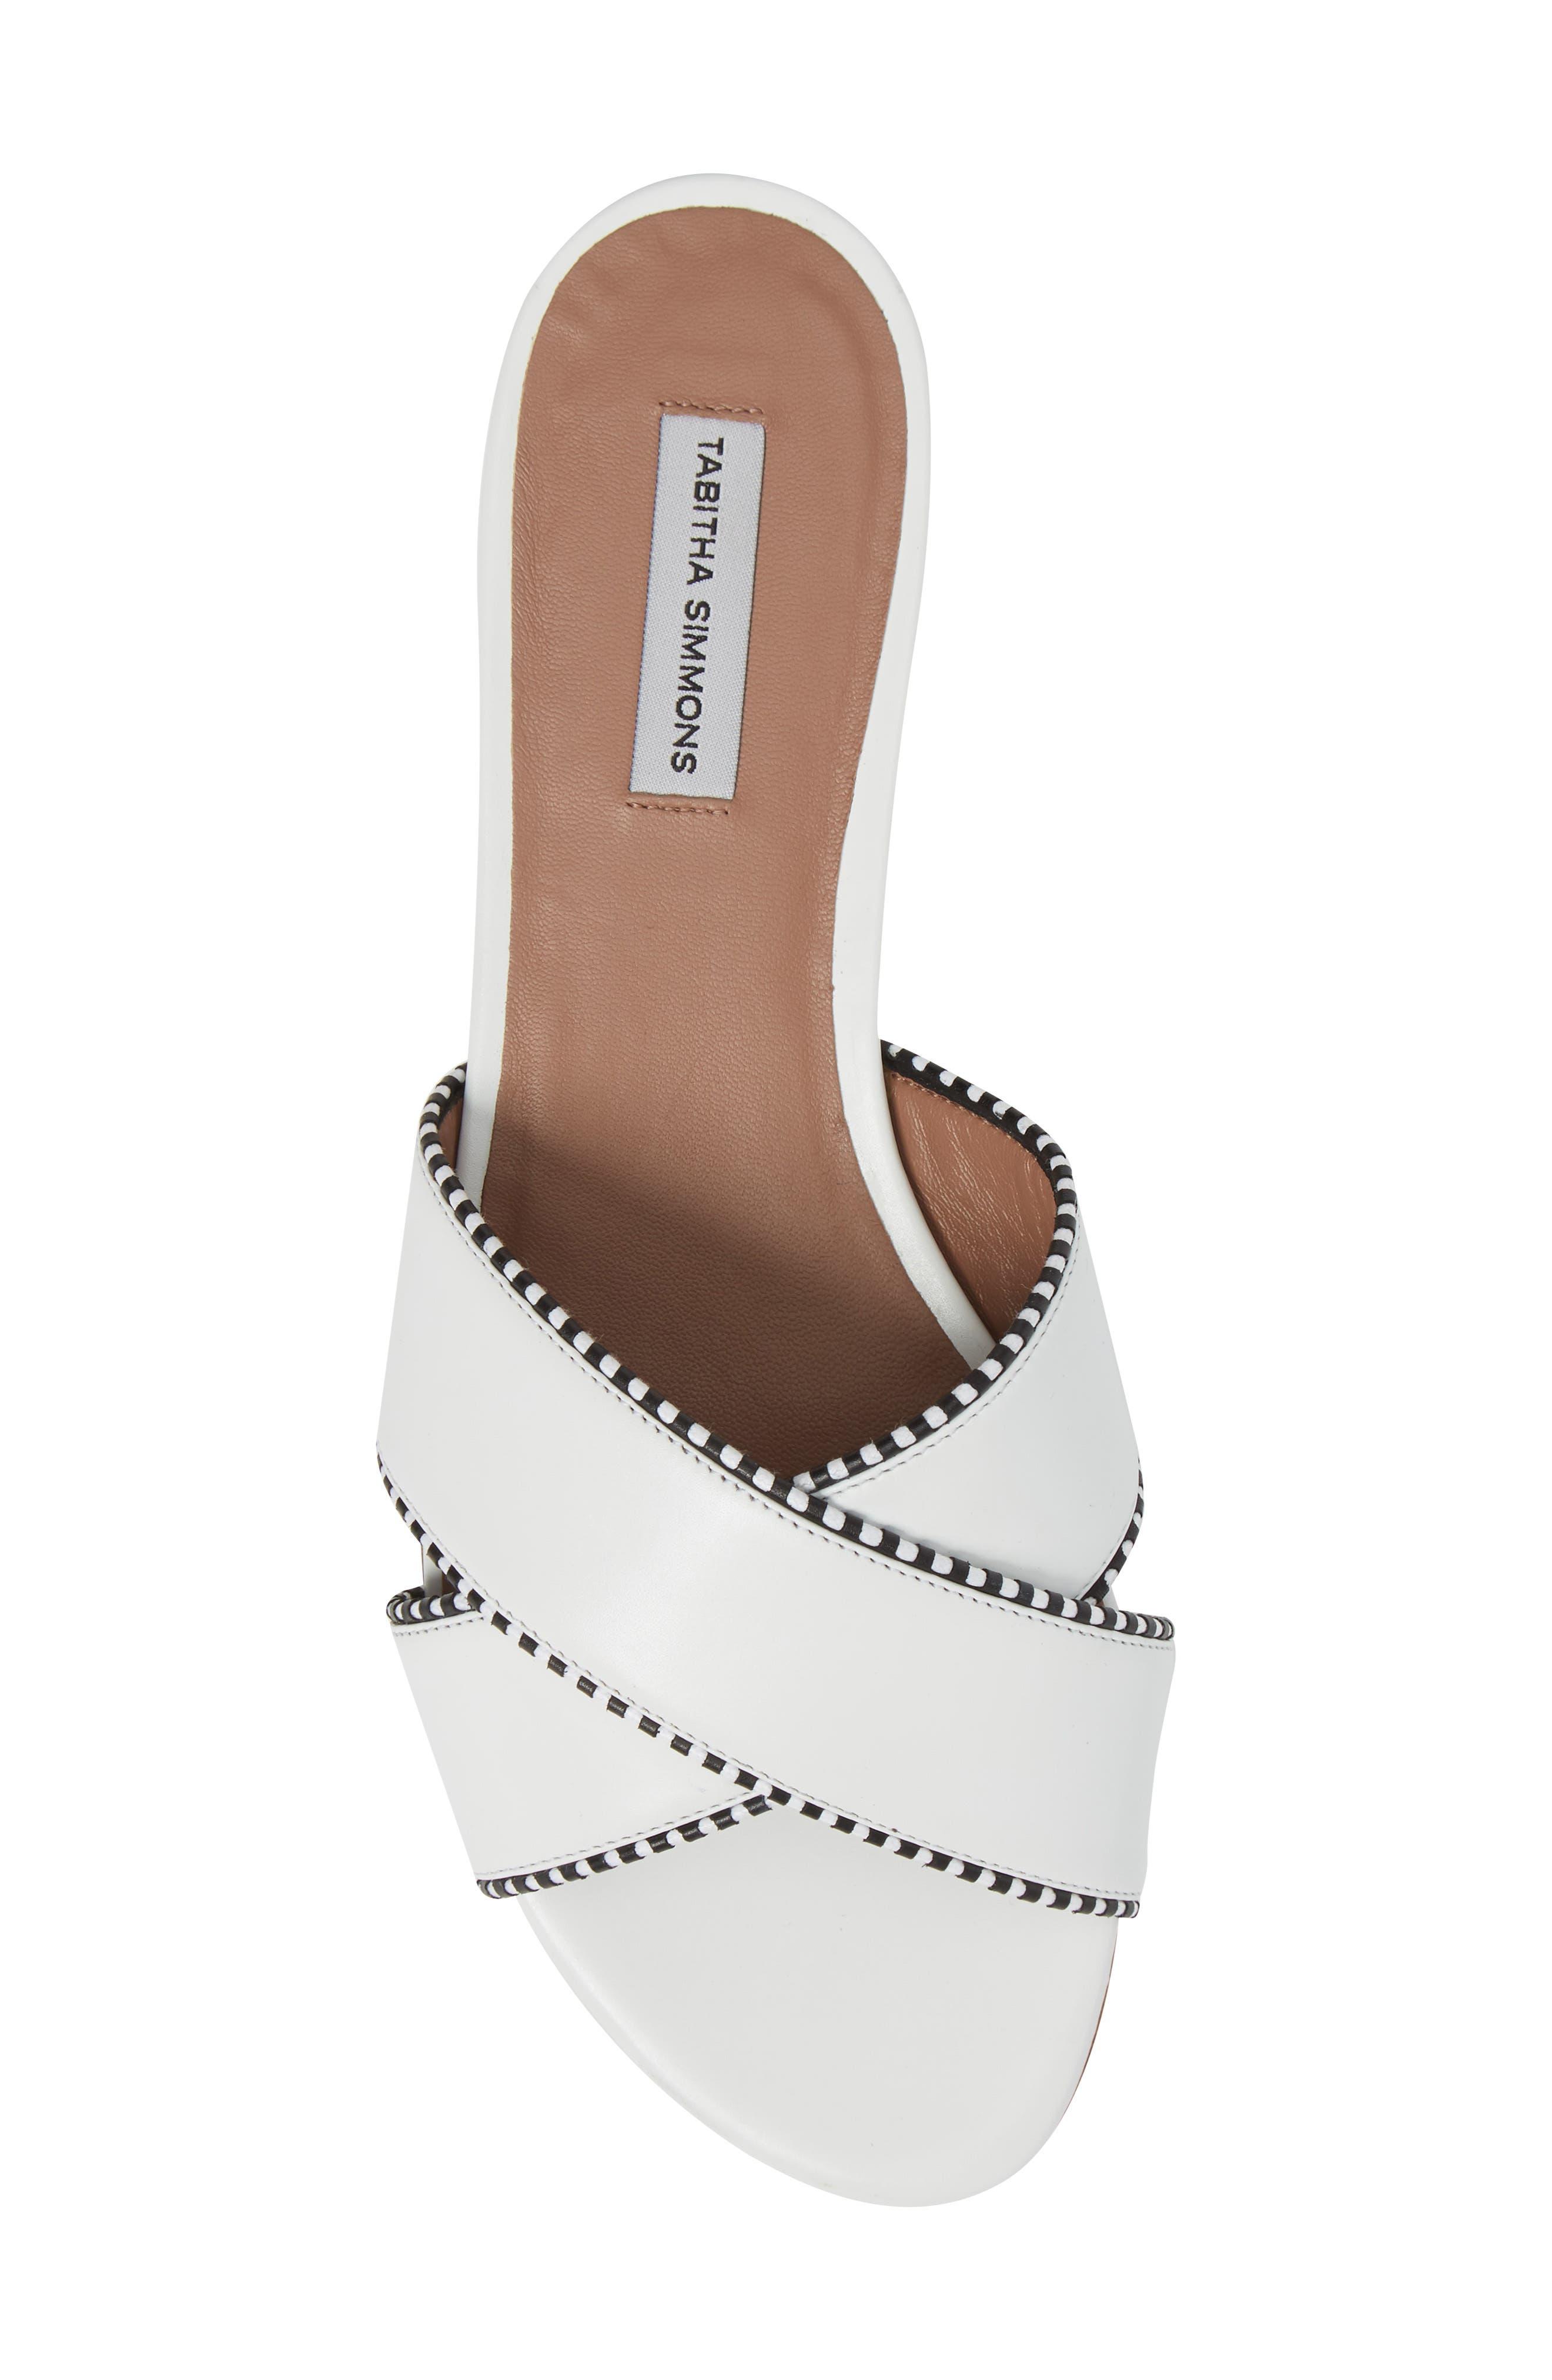 Lassie Profilo Slide Sandal,                             Alternate thumbnail 5, color,                             100